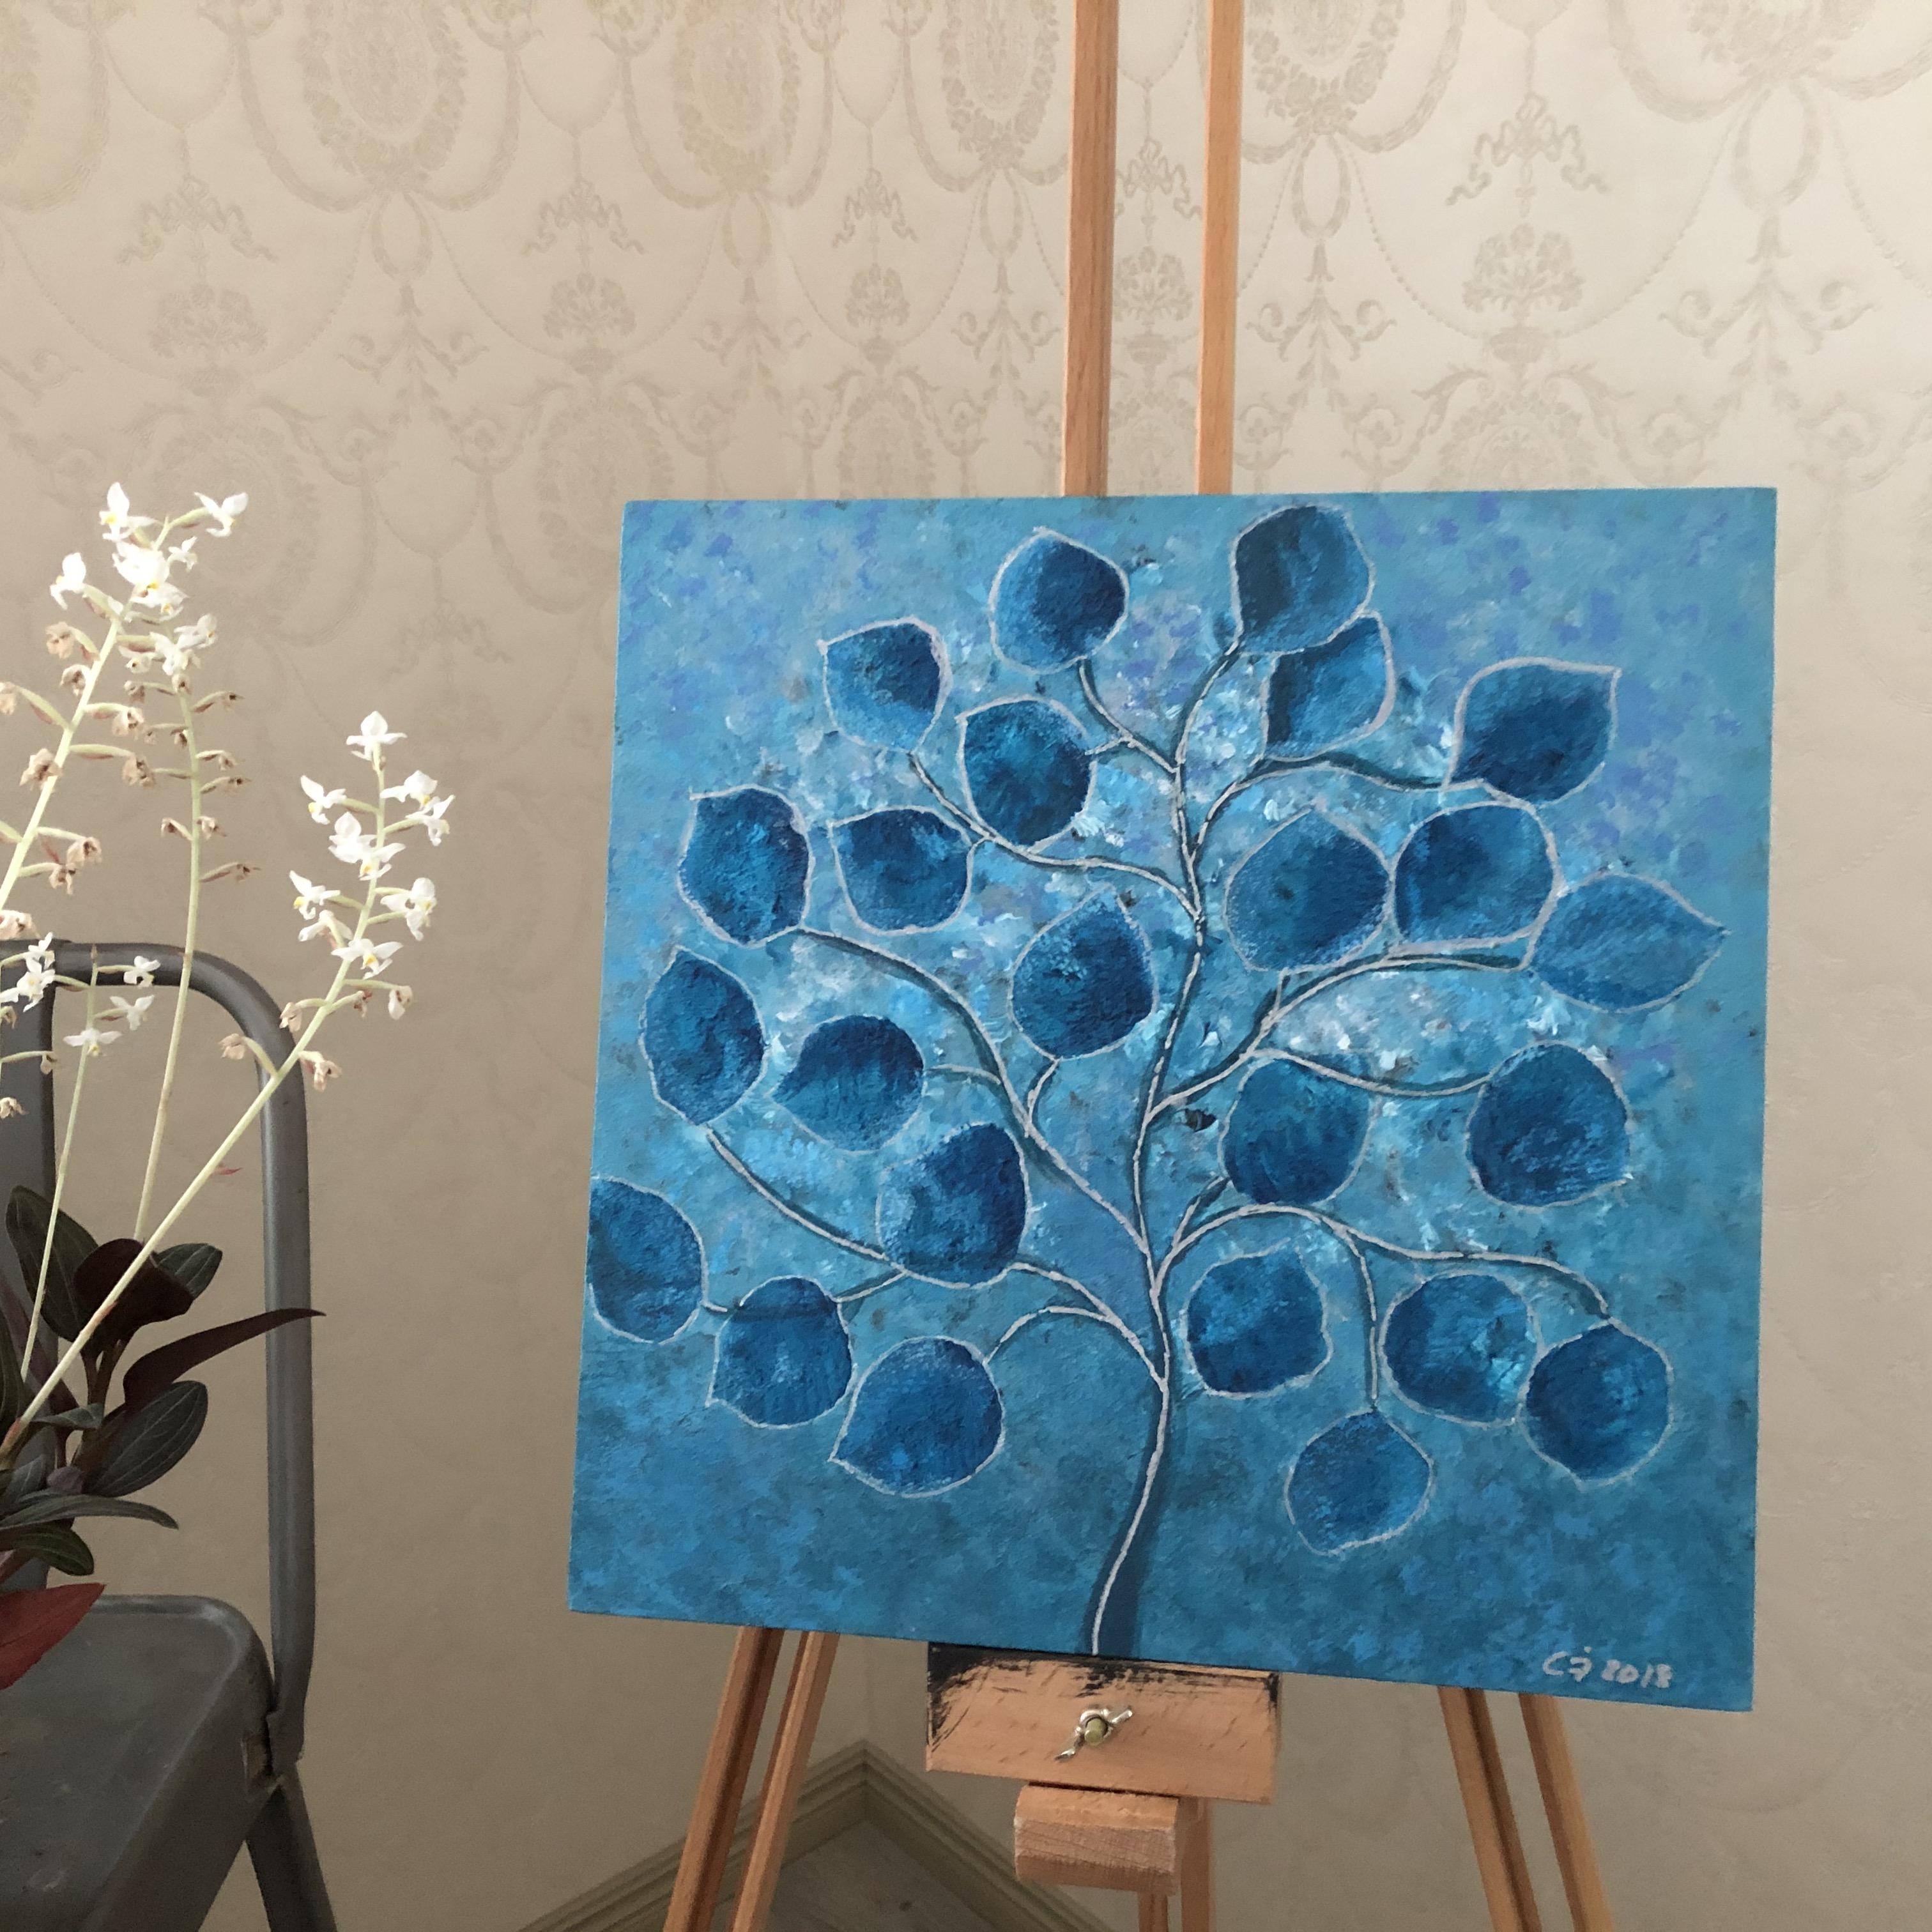 Pieni sininen puu, taulu 30 x30 cm